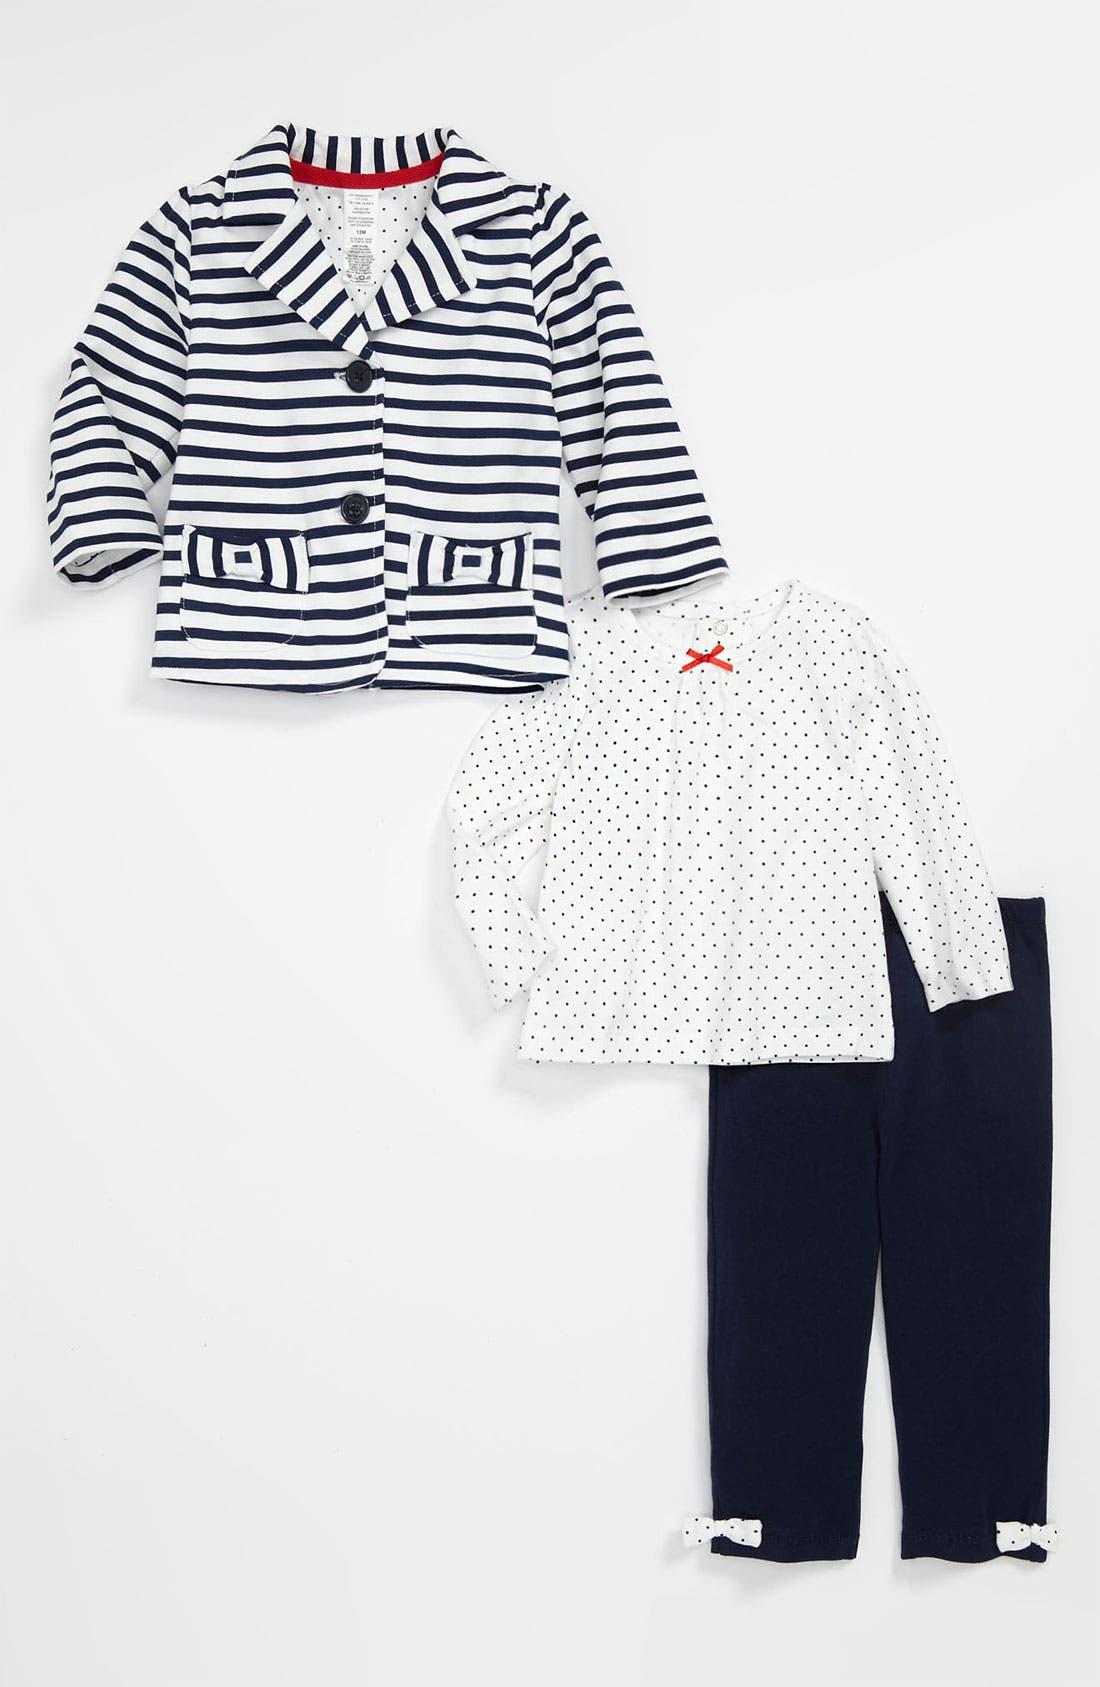 Main Image - Little Me Stripe Jacket, Top & Leggings (Infant)